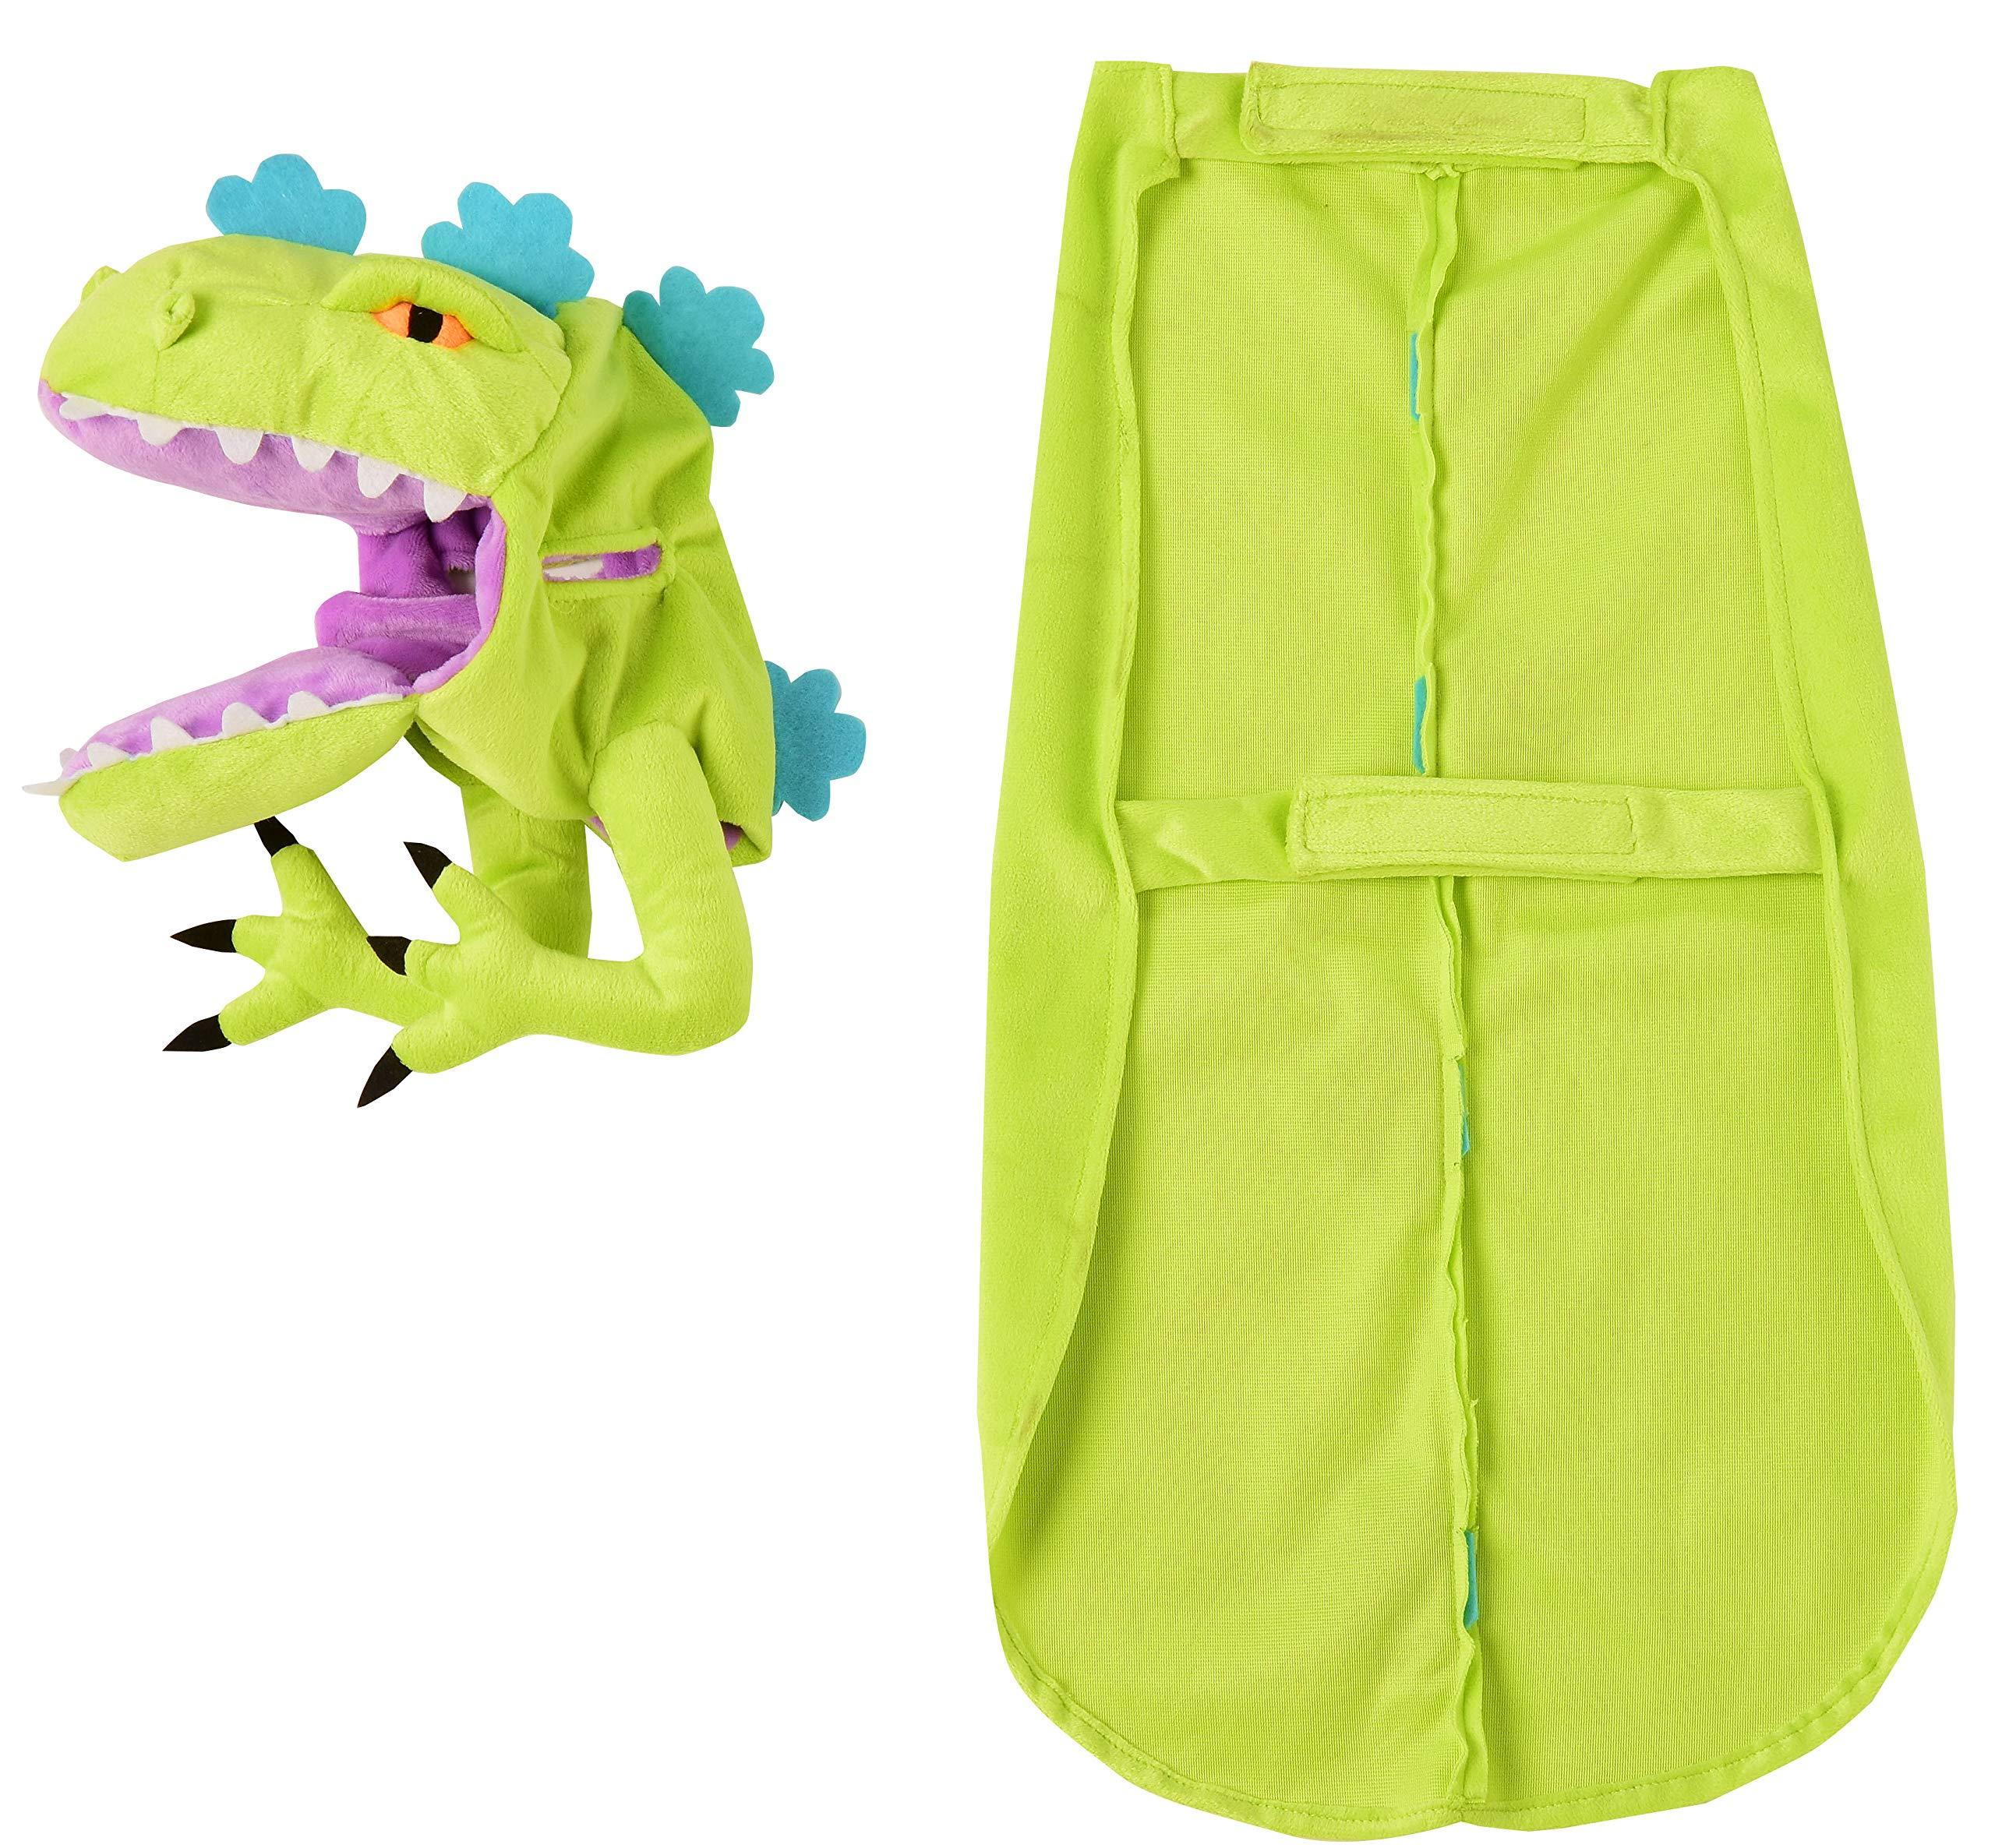 Nickelodeon Rubie's Rugrats Reptar Pet Costume, Small by Nickelodeon (Image #3)